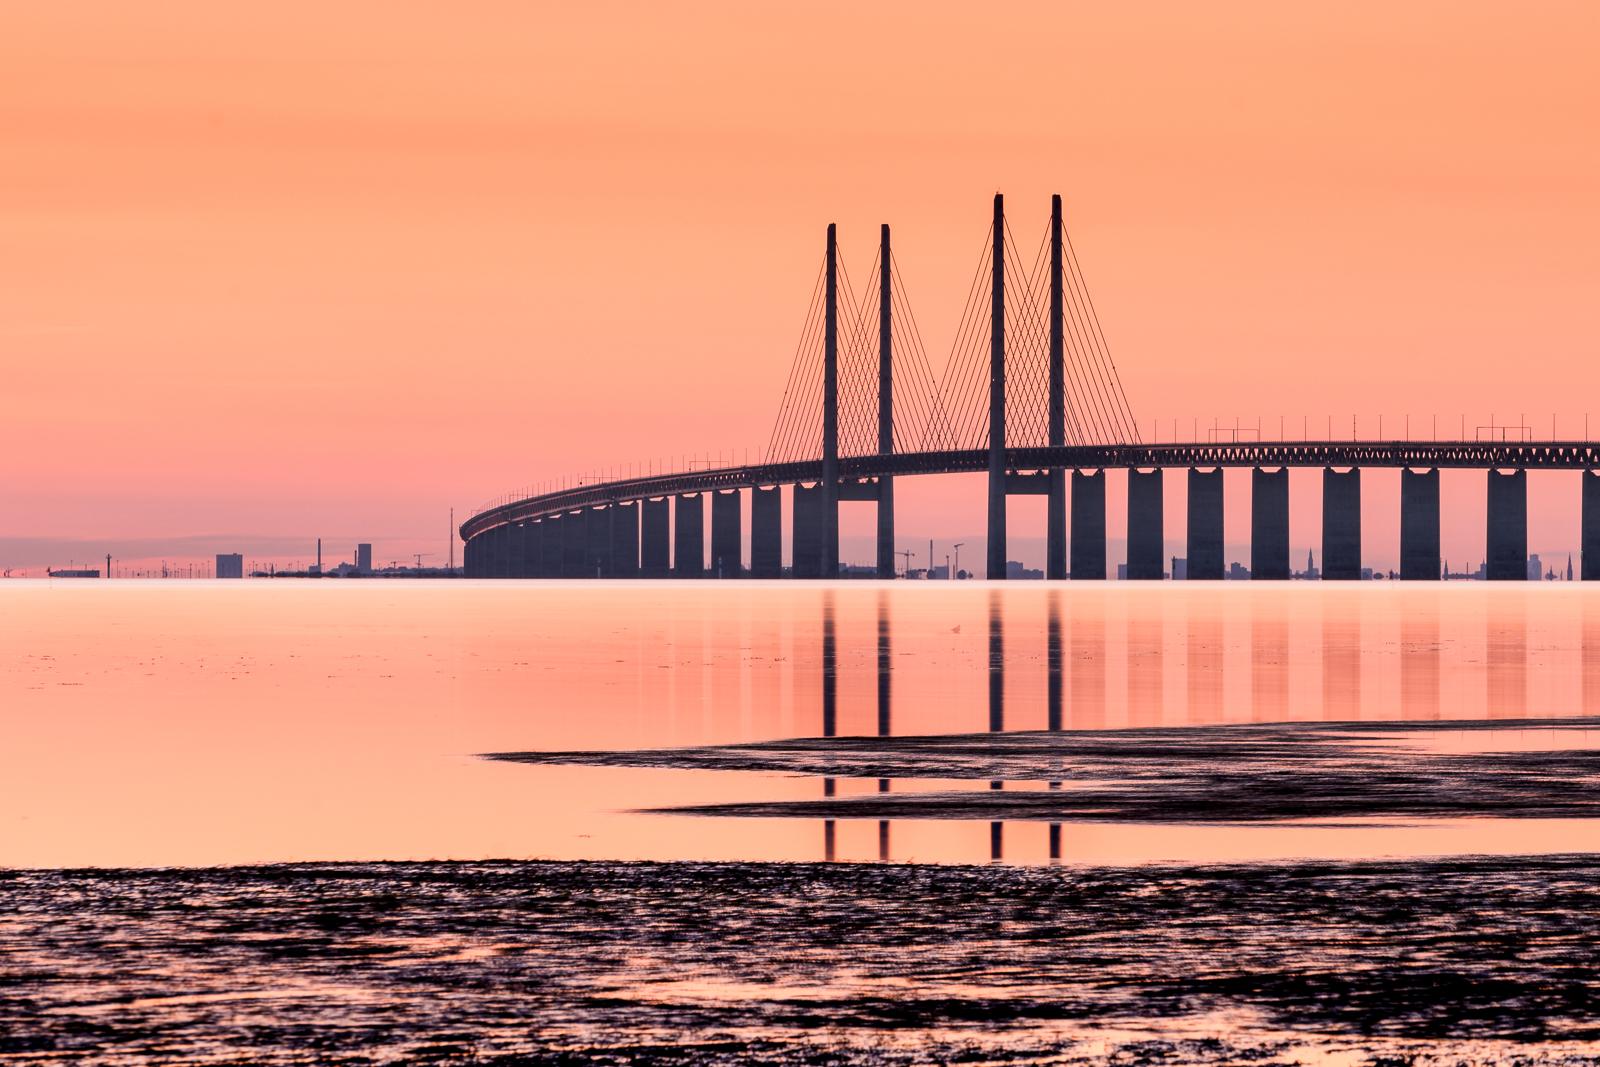 The Öresund bridge as seen from Bunkeflostrand